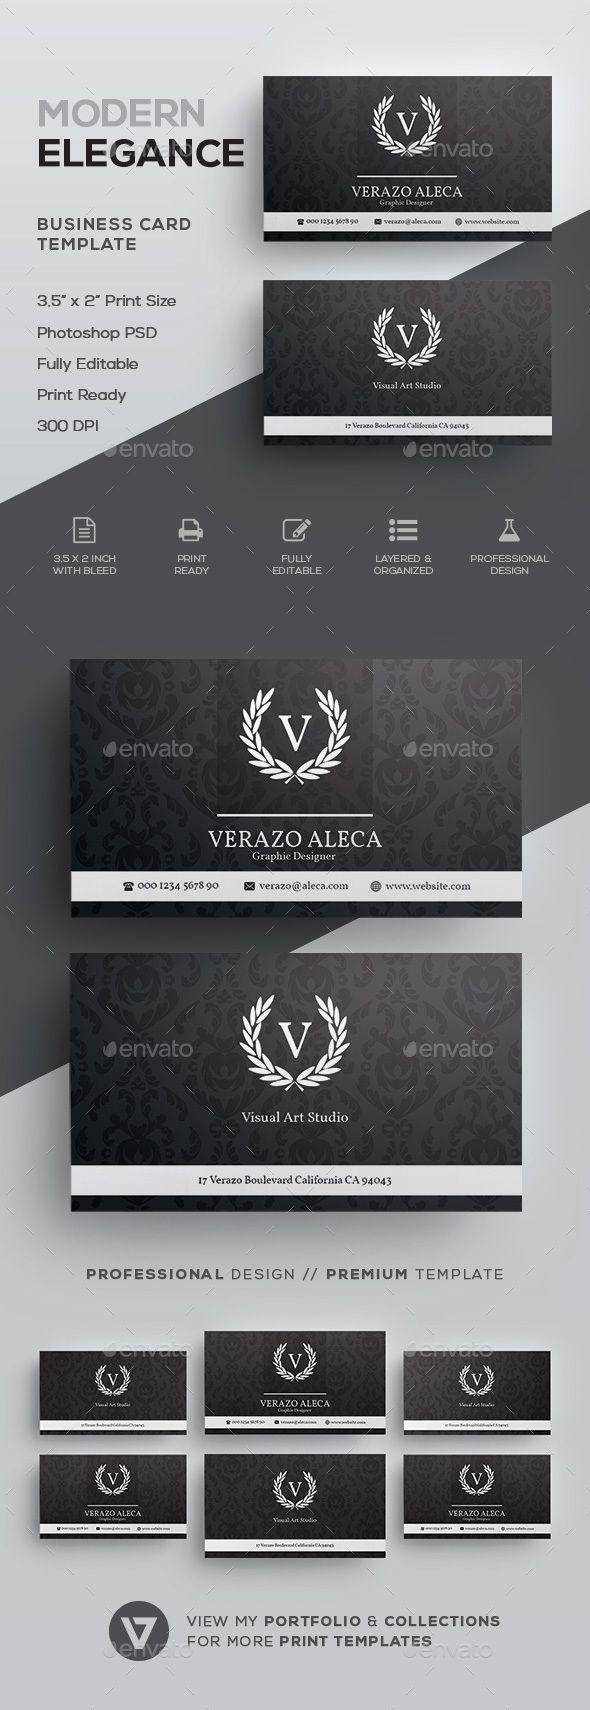 Elegant business card template cartes de visita visita e carto elegant business card template reheart Gallery